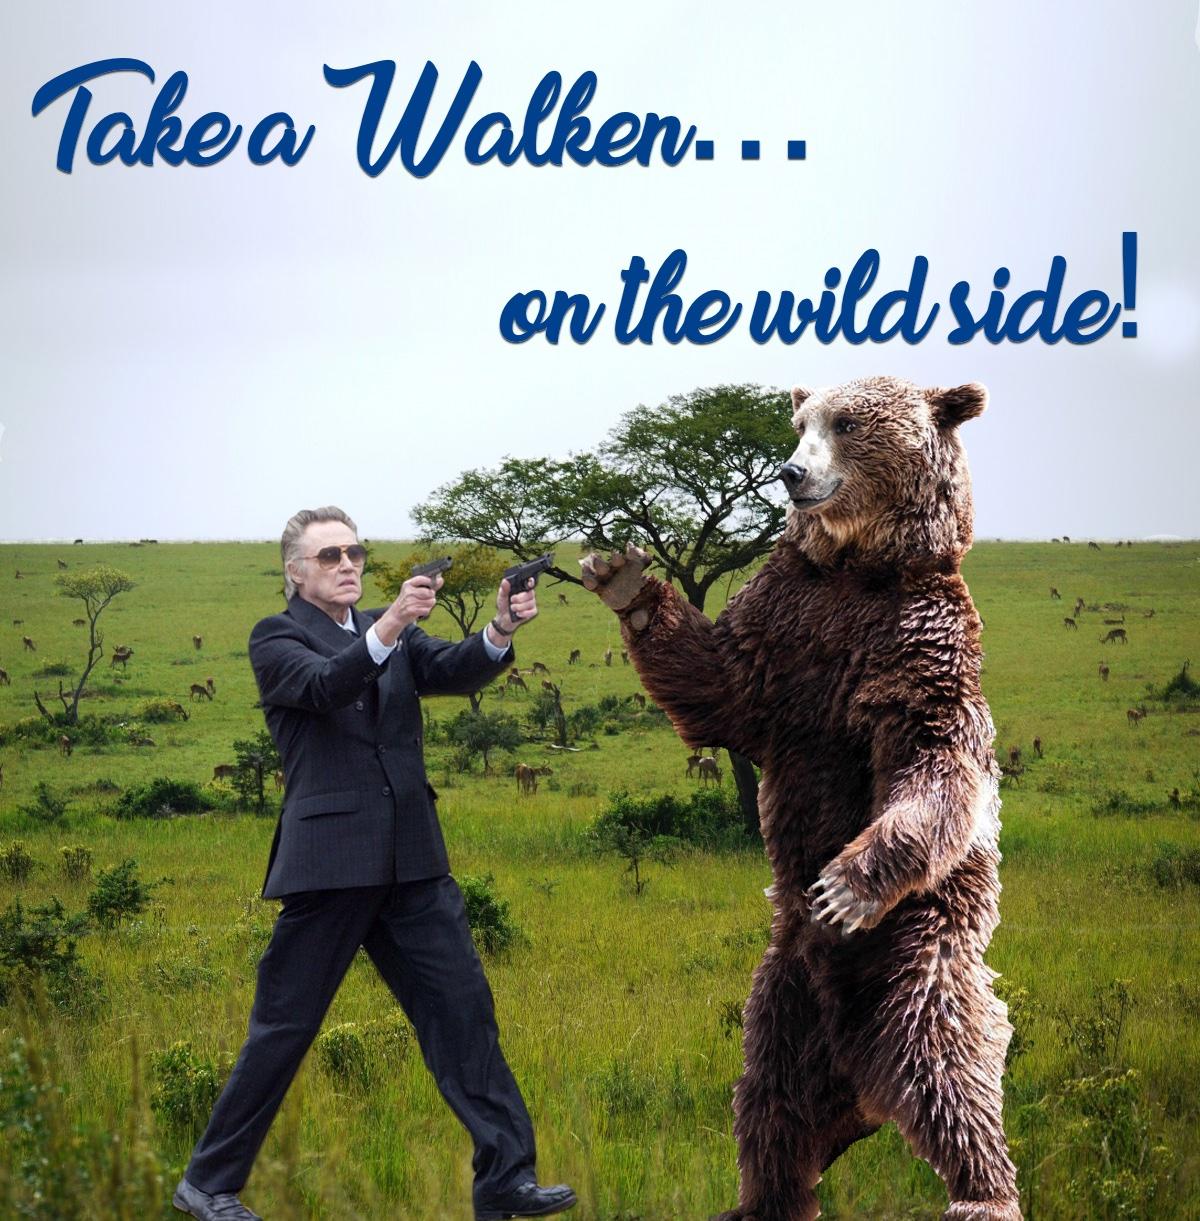 Christopher Walken, on the wild side